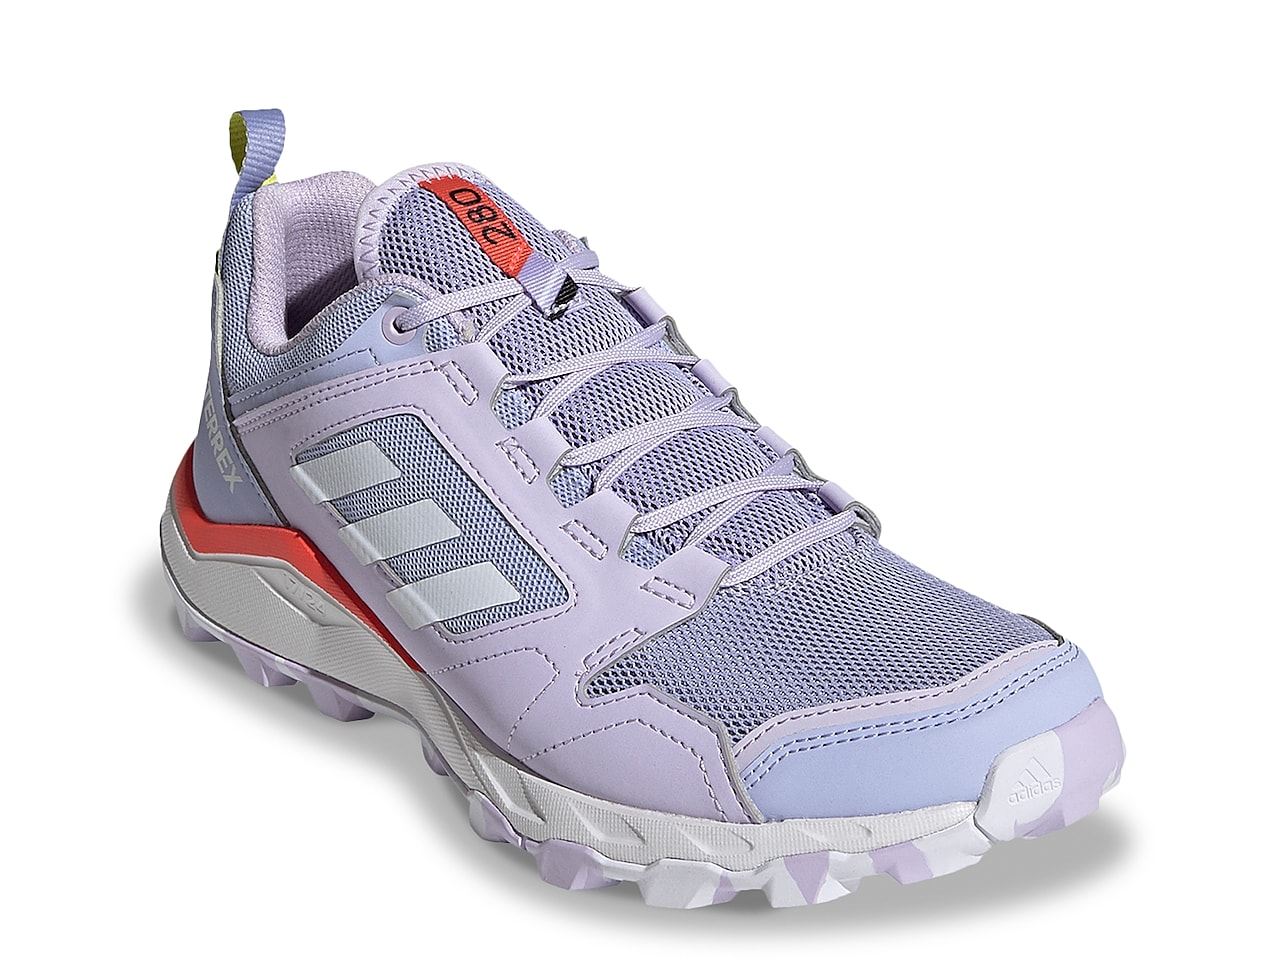 adidas Terrex Agravic Trail Running Shoe - Women's